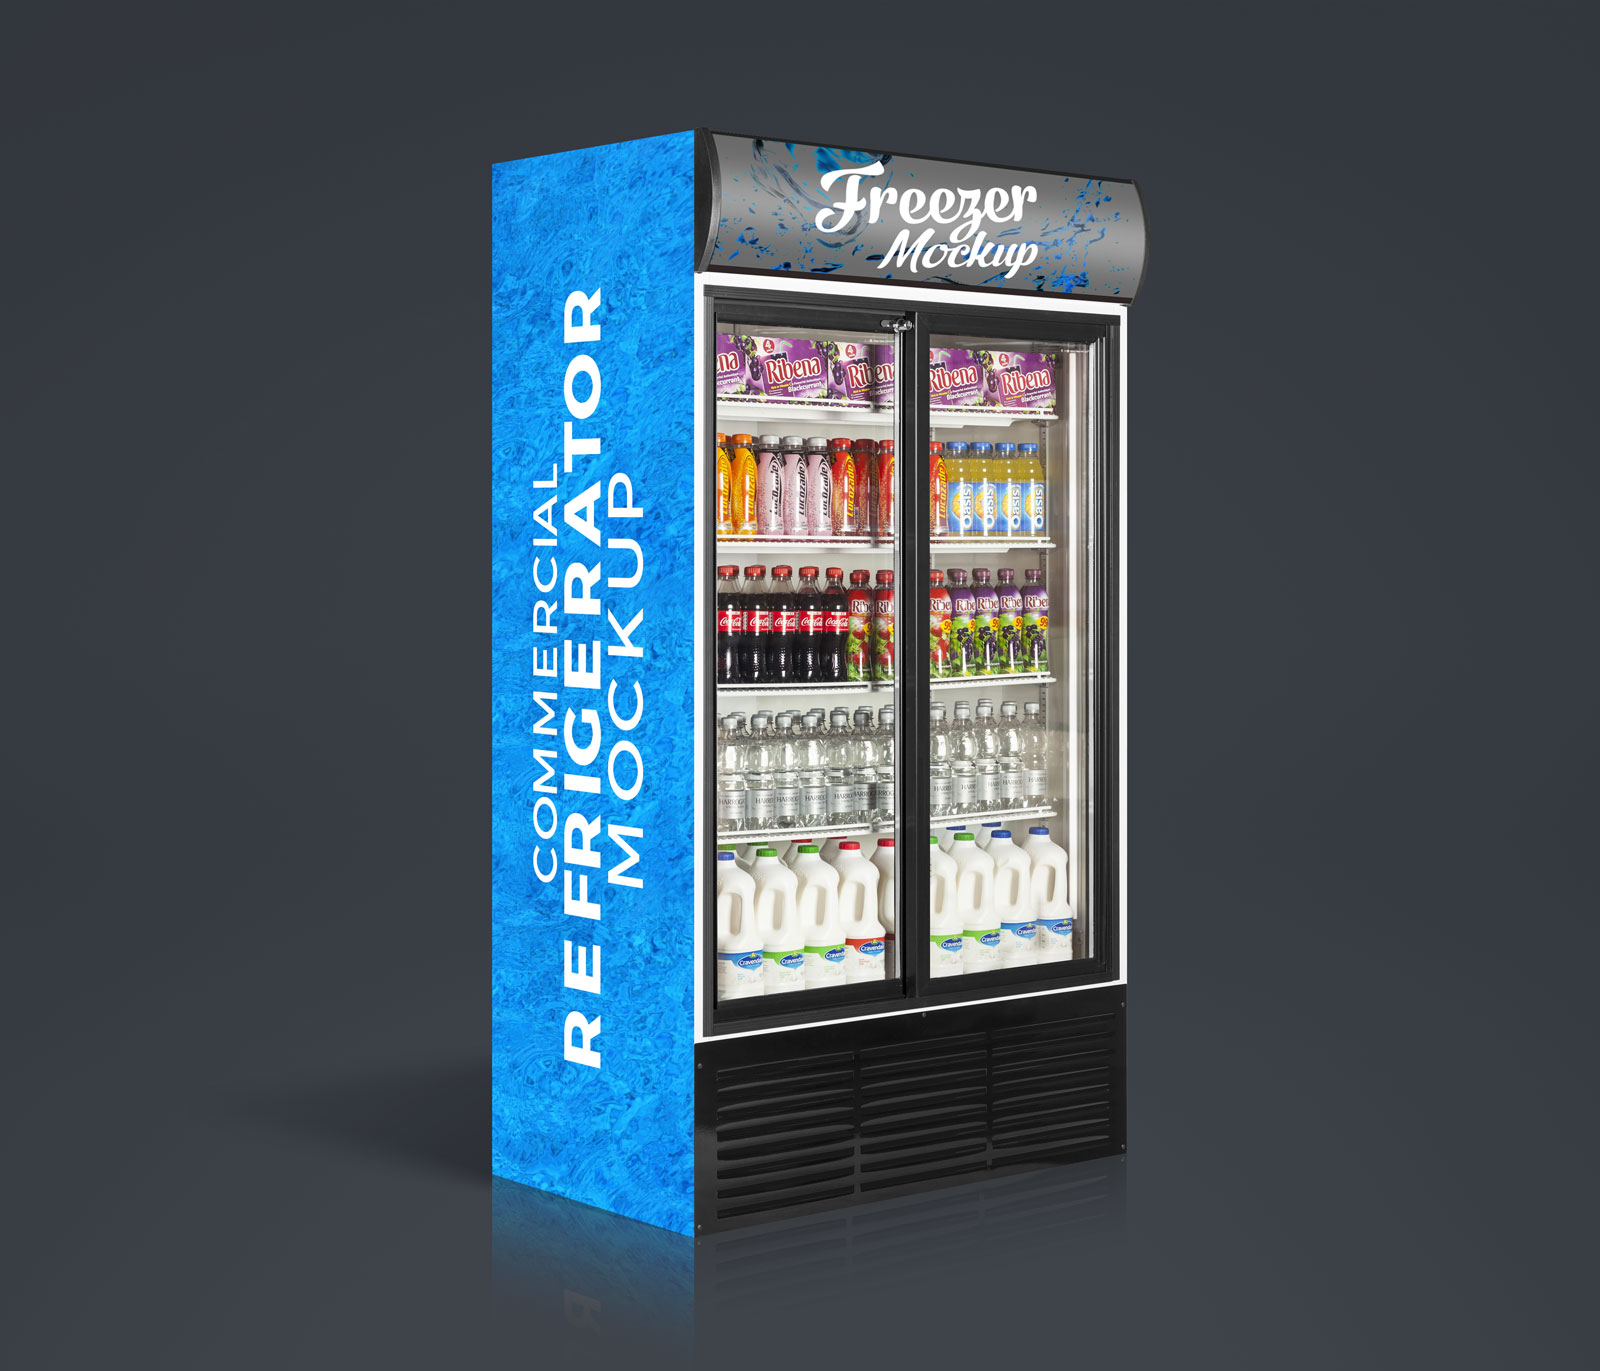 Free-Commercial-Refrigerator,-Cooler-Freezer-Mockup-PSD-3